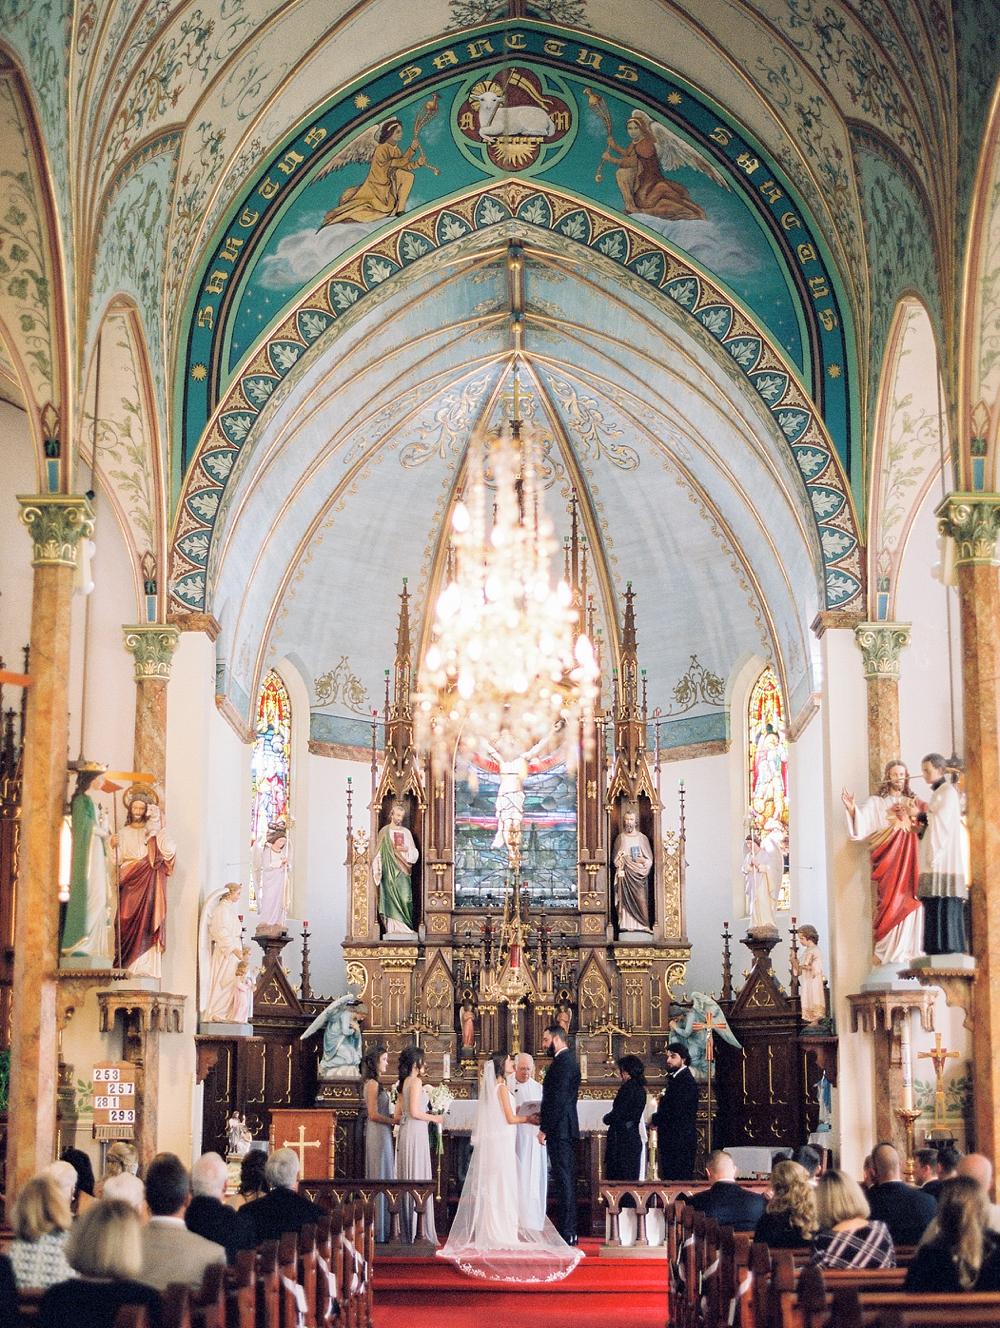 Kristin-La-Voie-Photography-austin-houston-texas-wedding-photographer-the-oaks-at-high-hill -213